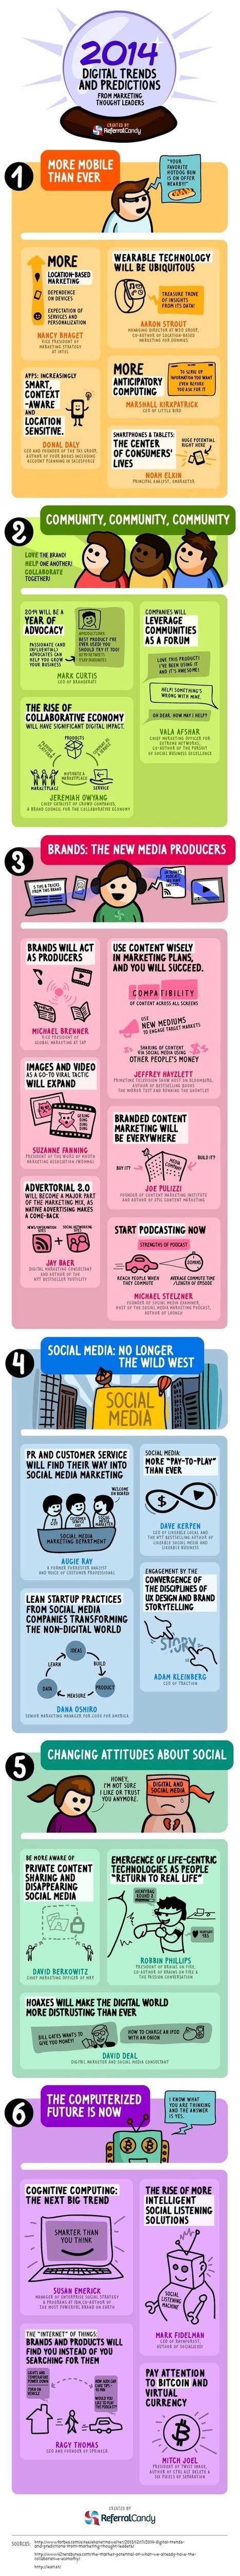 Tendencias digitales y predicciones en 2014 para Marketing | Managing Technology and Talent for Learning & Innovation | Scoop.it